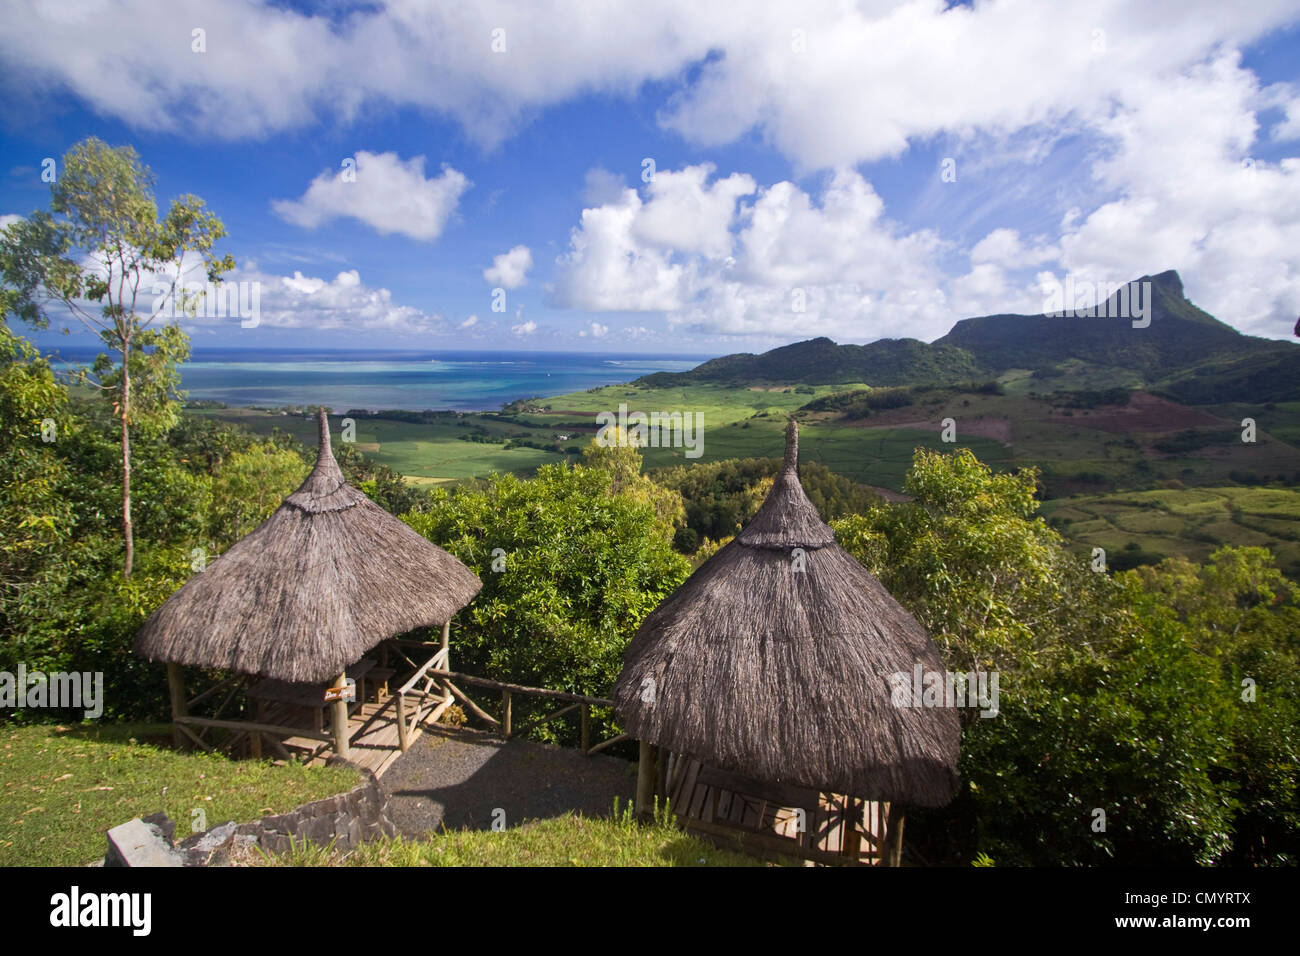 Wildpark und Resort Domain du Chasseur, Mauritius, Afrika Stockbild